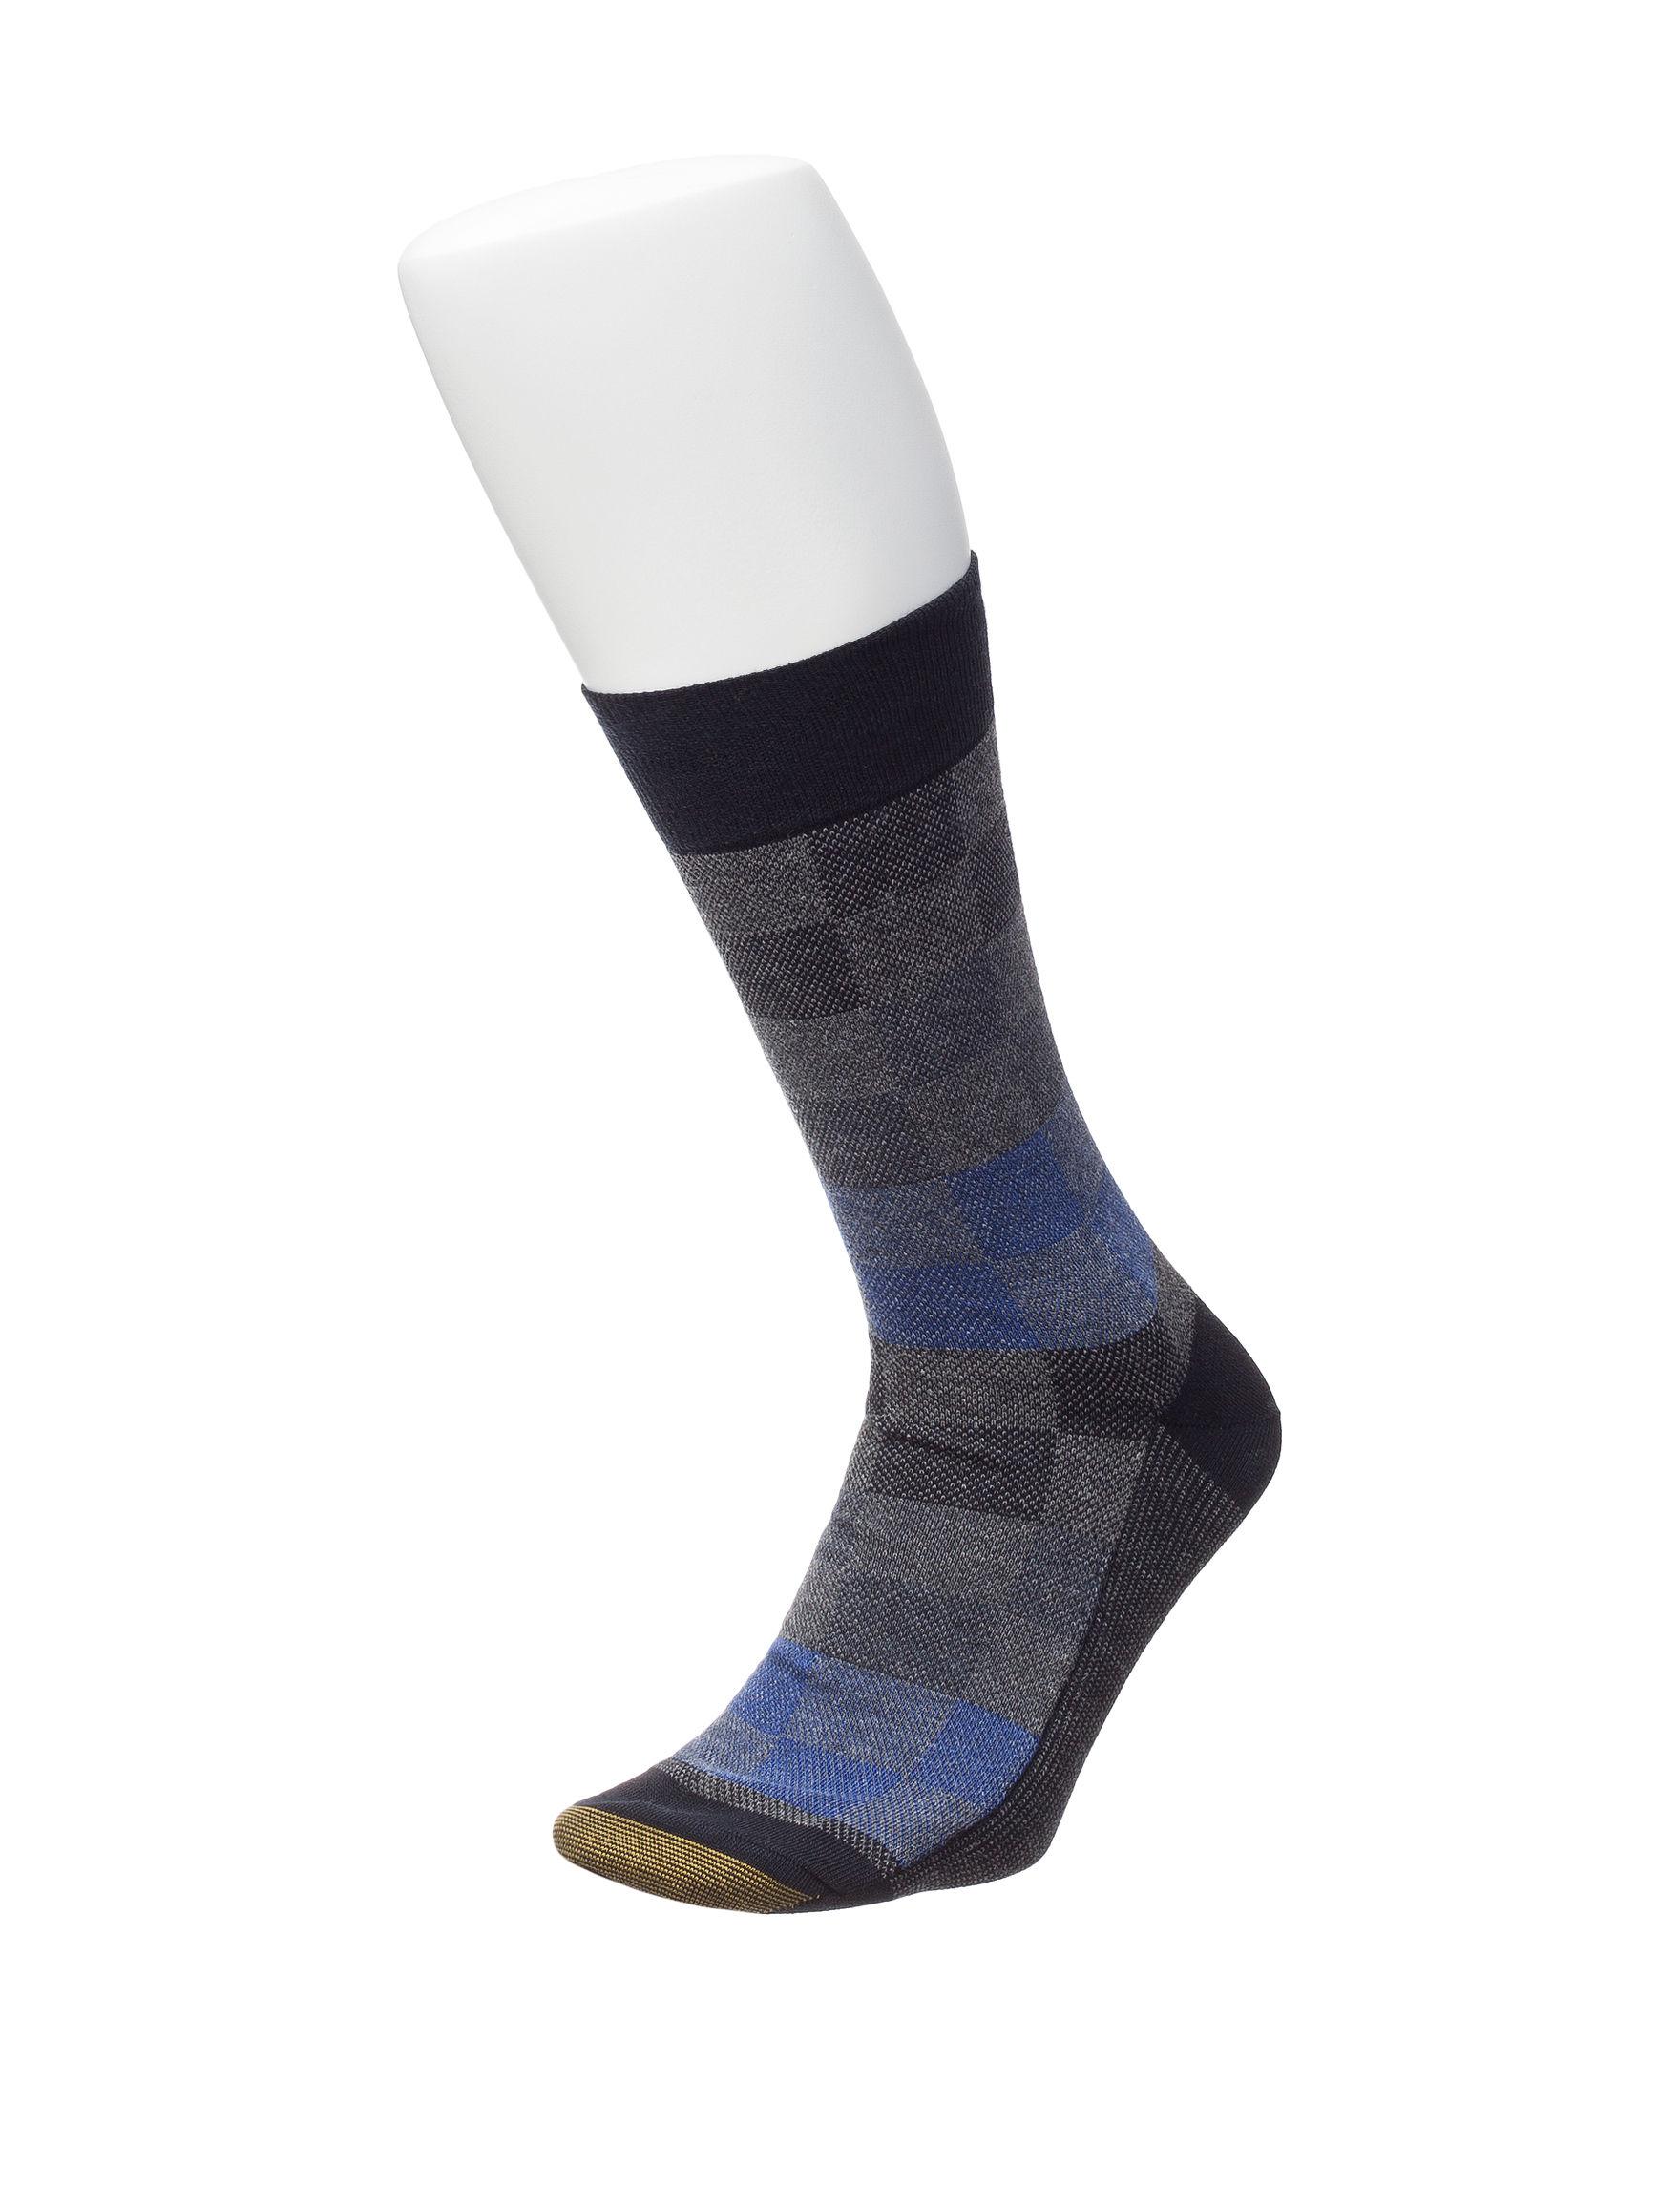 Gold Toe Blue Socks